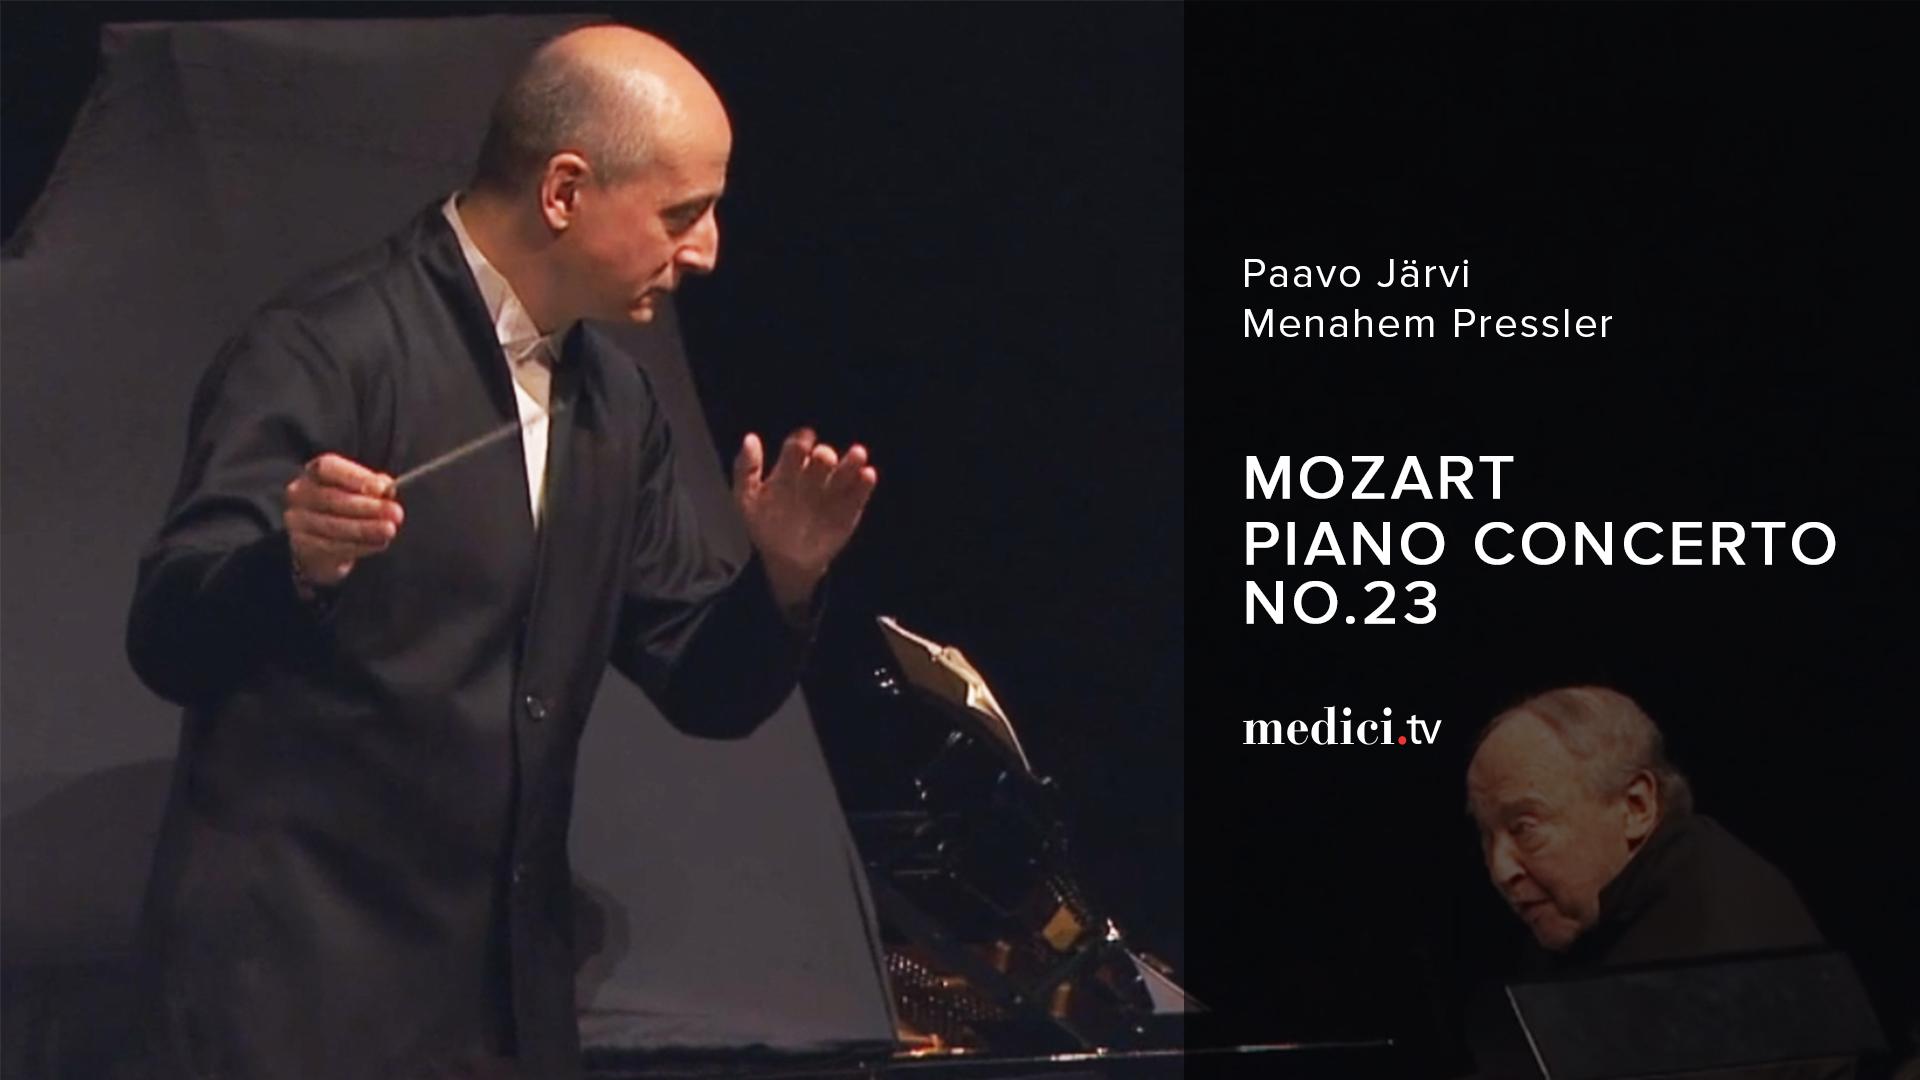 Mozart, Piano Concerto No. 23 - Paavo Järvi, Menahem Pressler - Orchestre de Paris